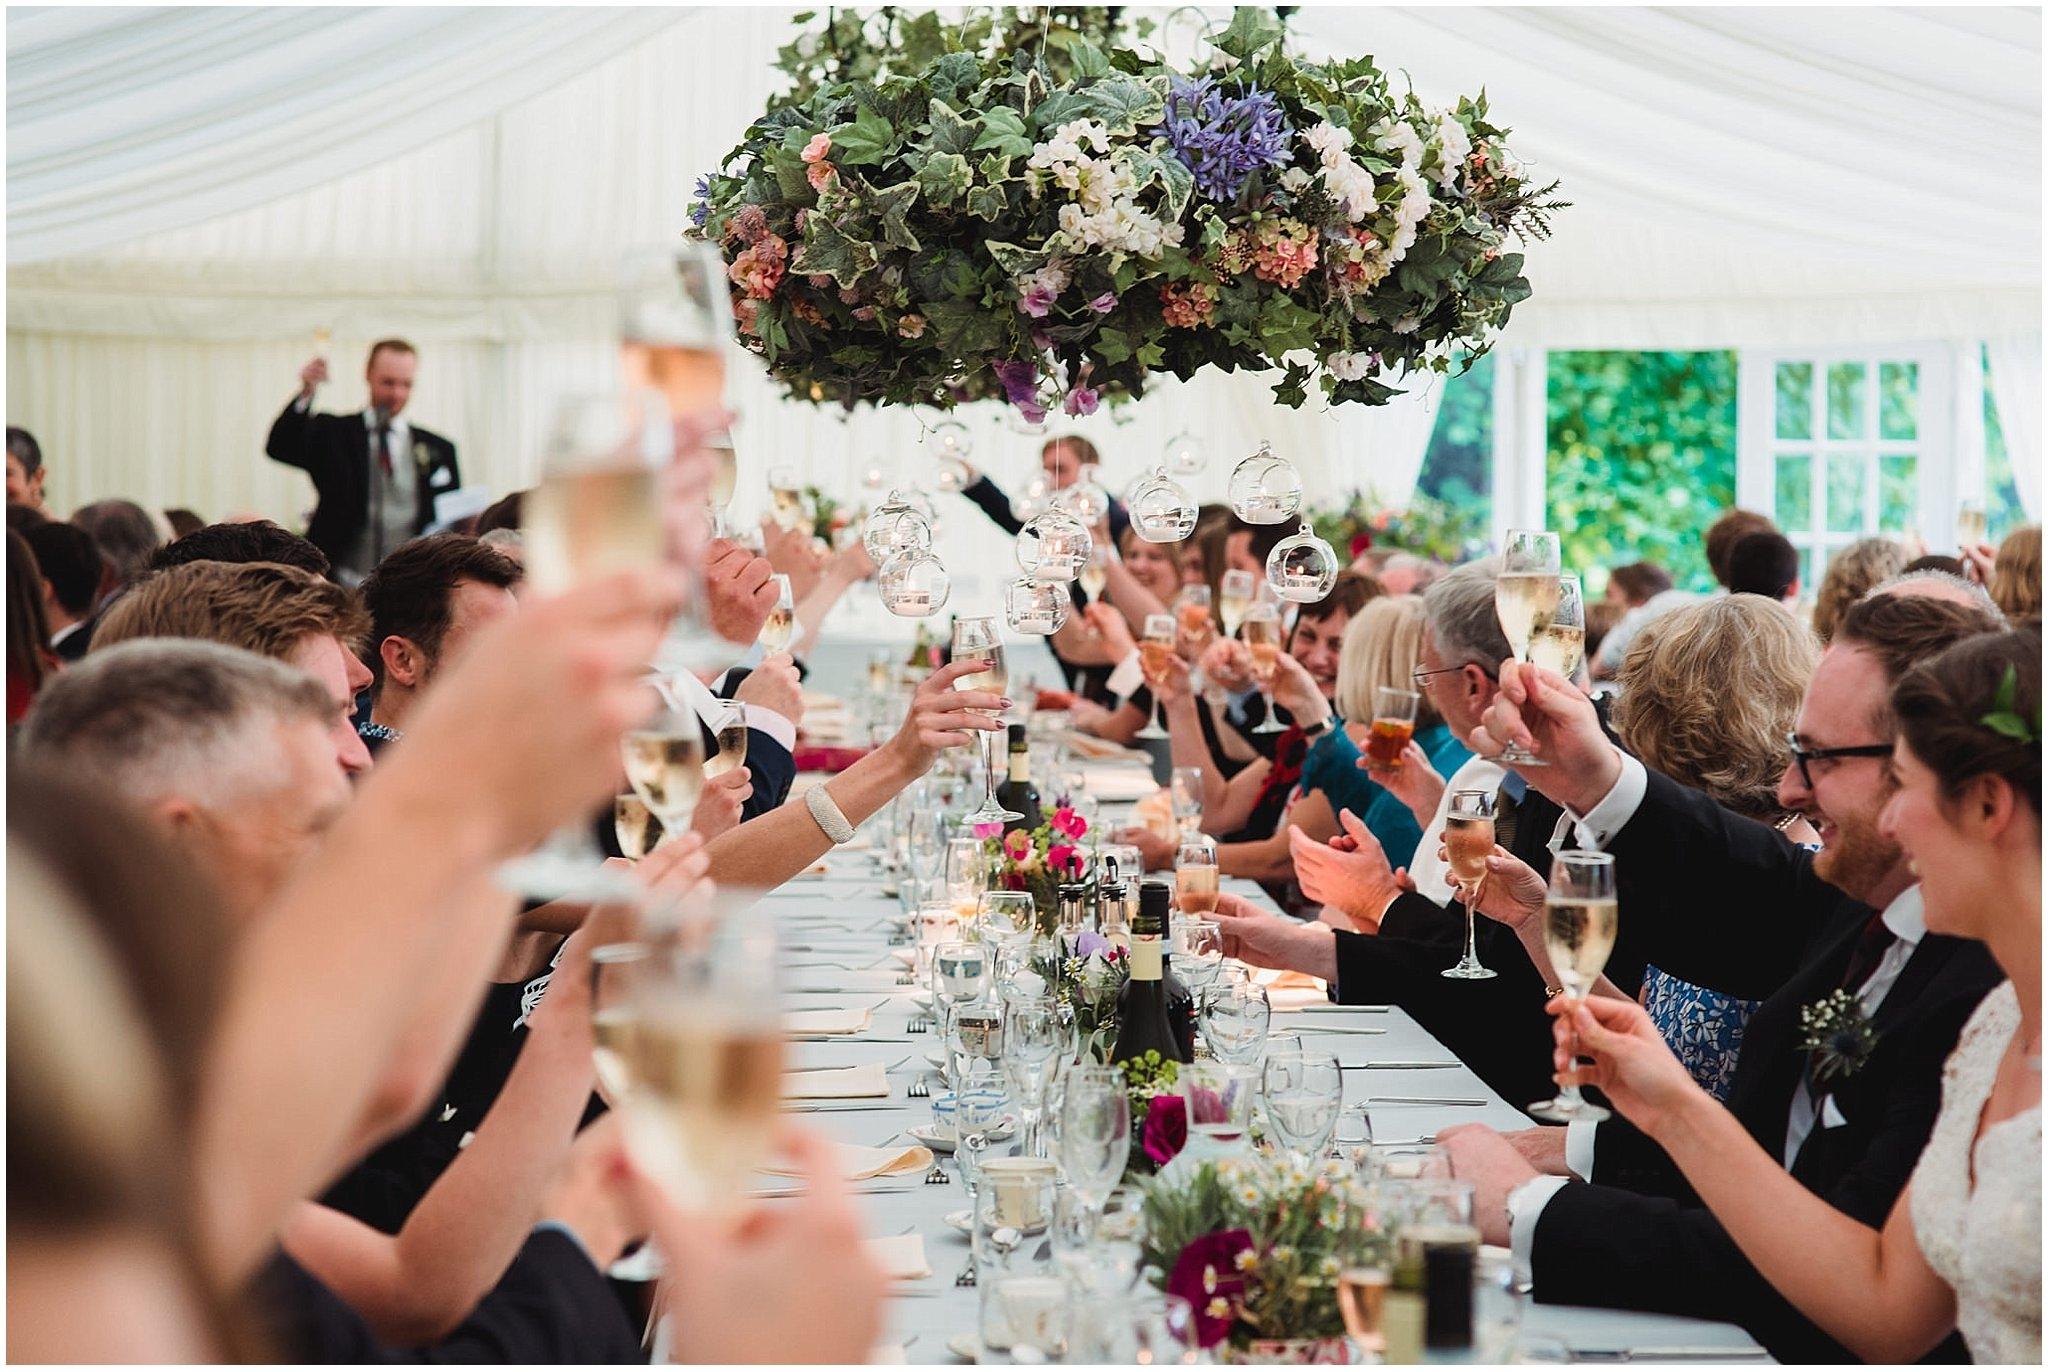 Wedding marquee floral hanging centrepiece